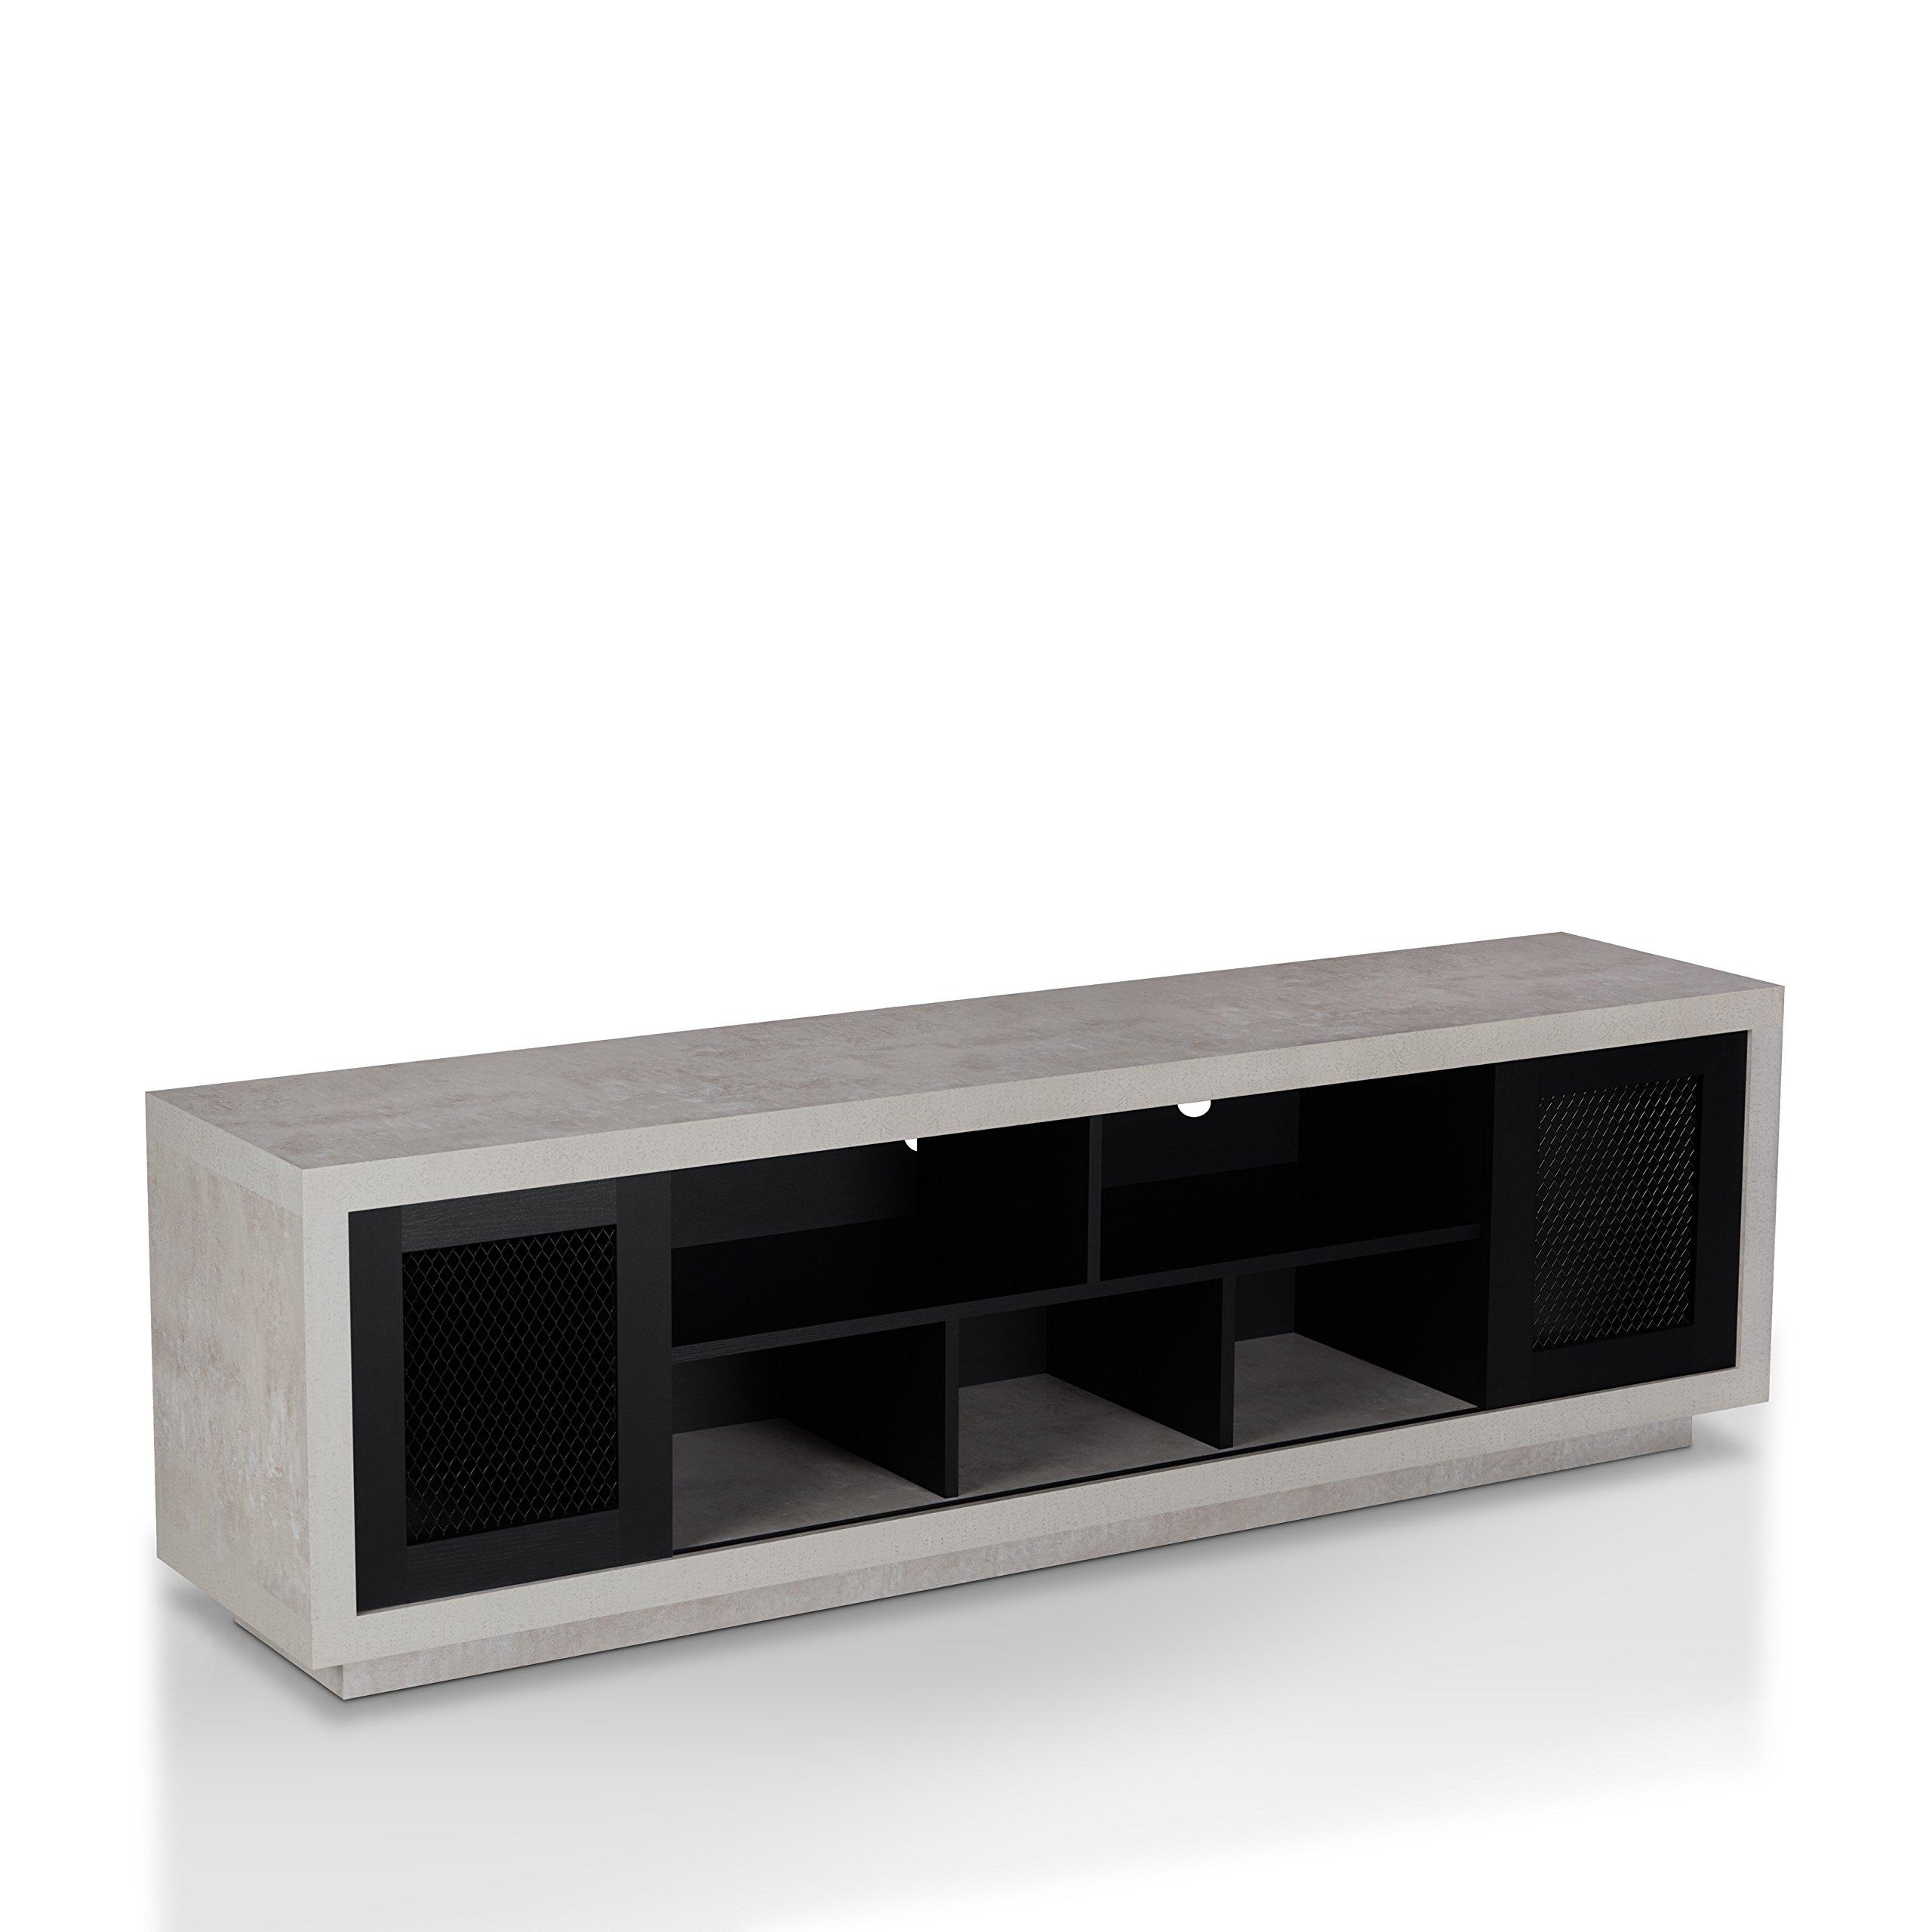 HOMES: Inside + Out FGI-1782C1 Vaike TV Stand, Black